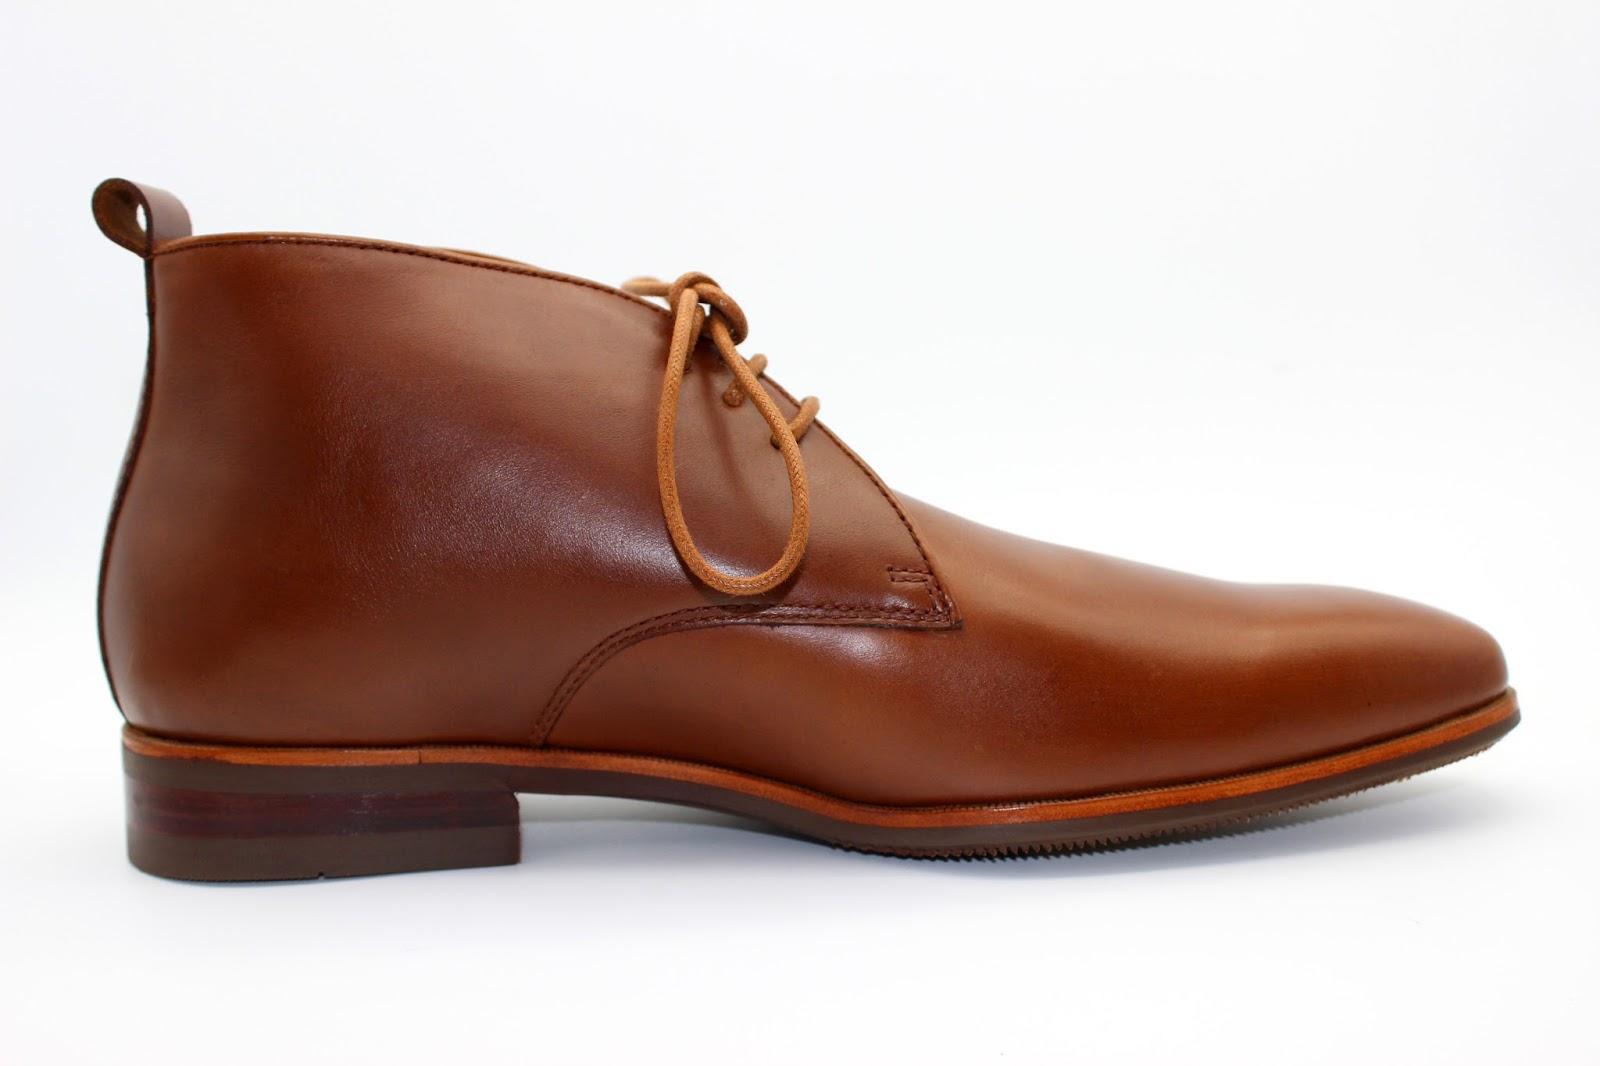 Mẫu giày da xịn 100% của Jiminor